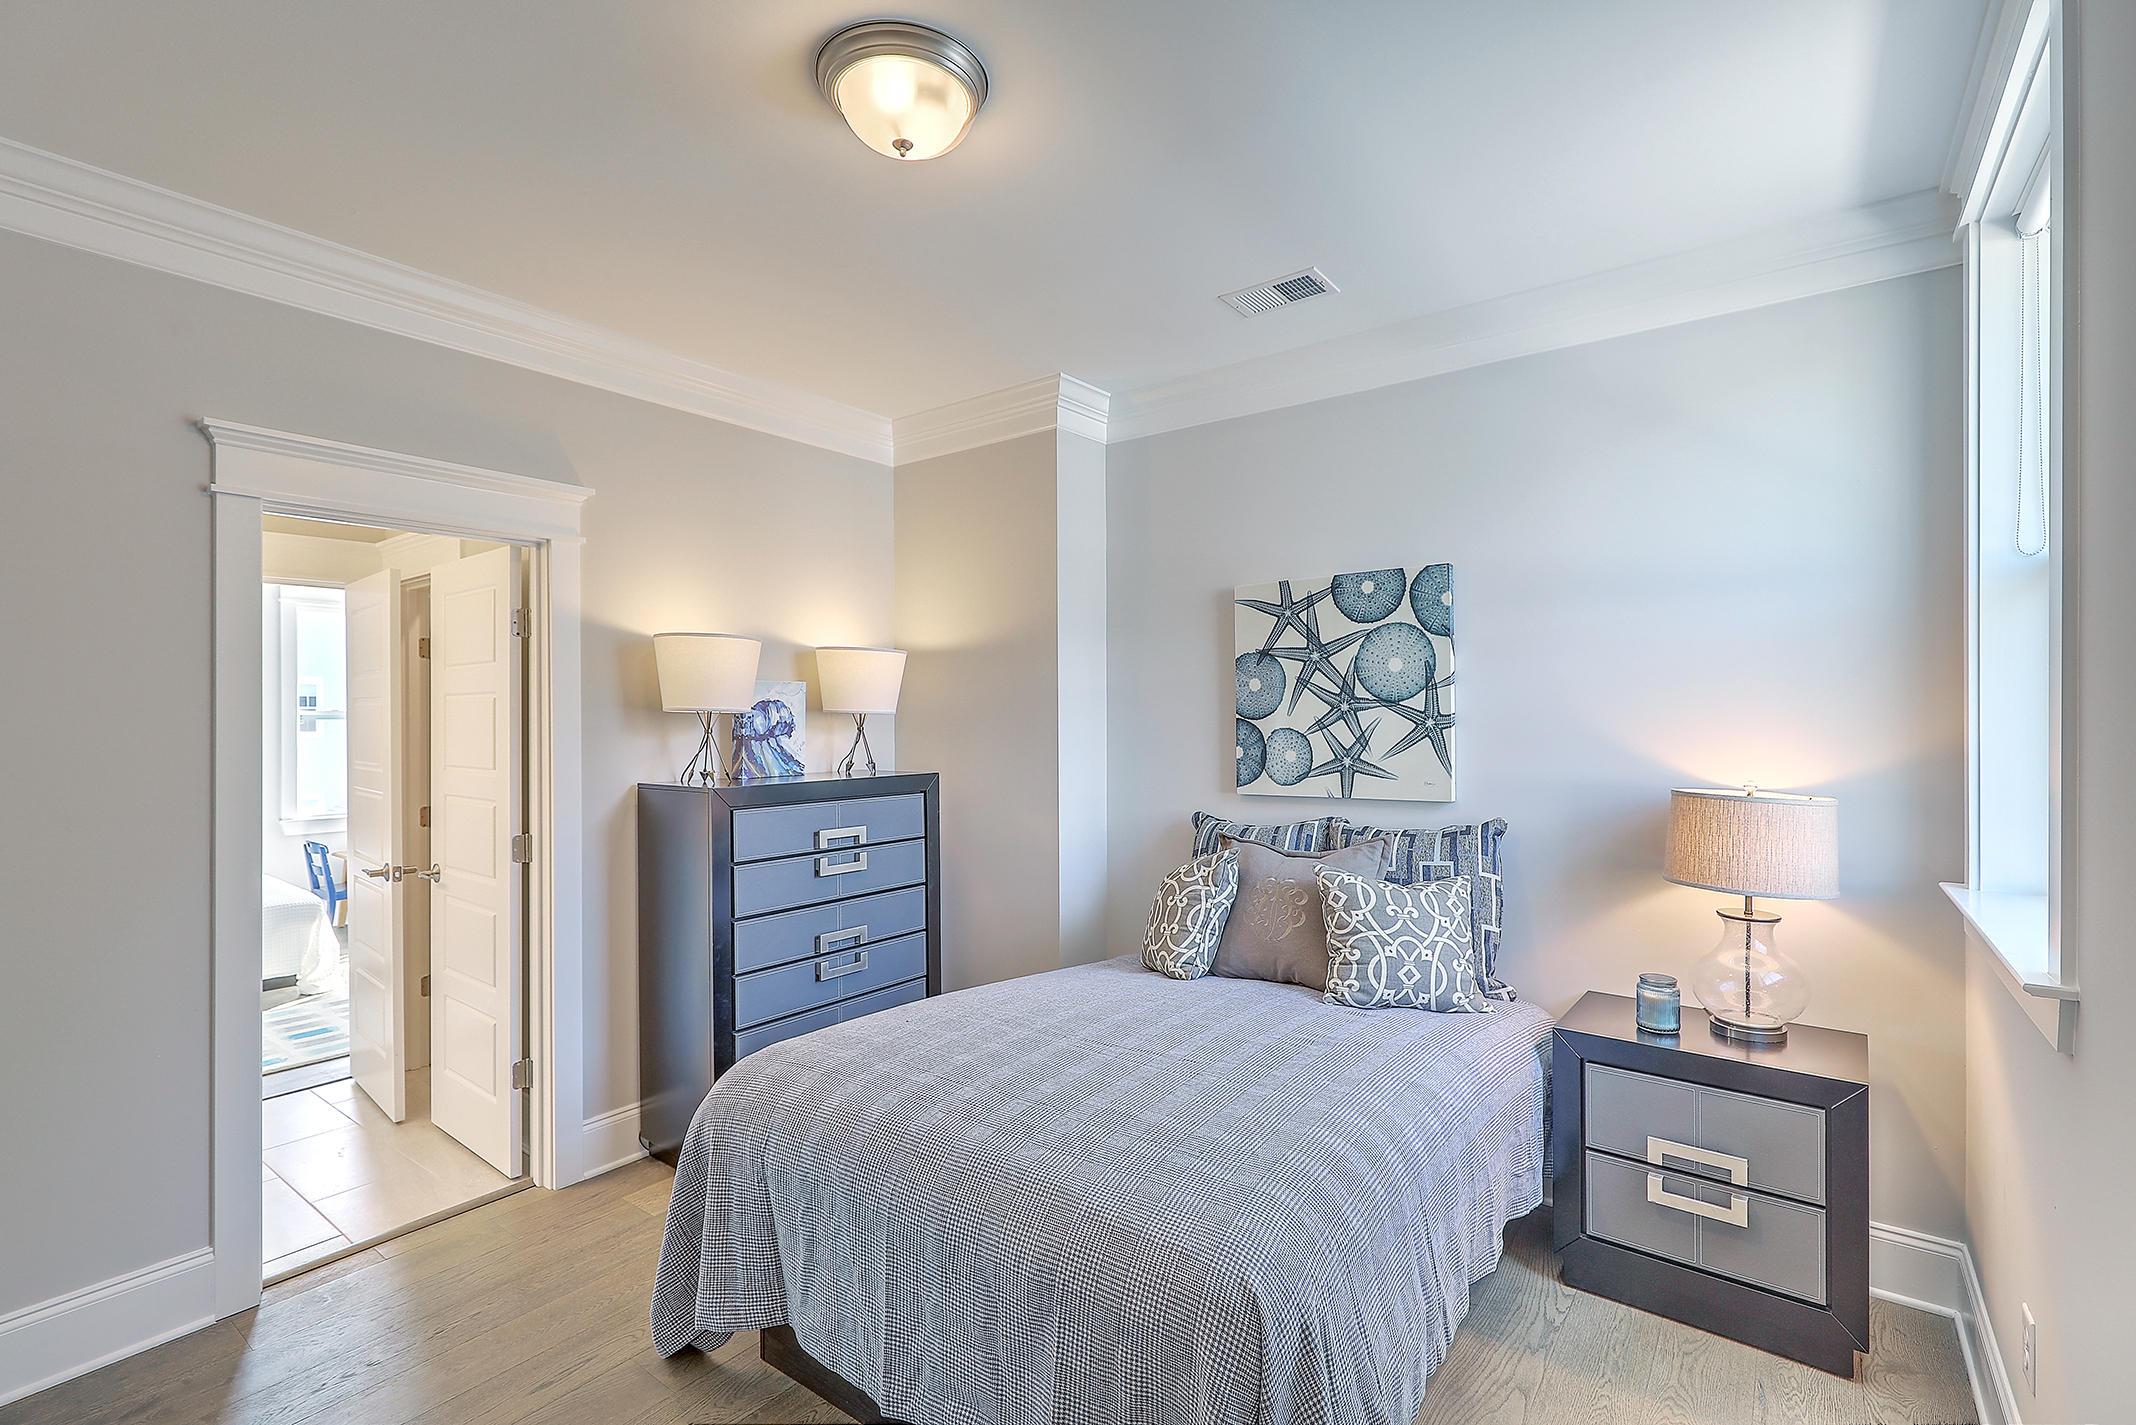 Carolina Park Homes For Sale - 3593 Crosstrees, Mount Pleasant, SC - 0